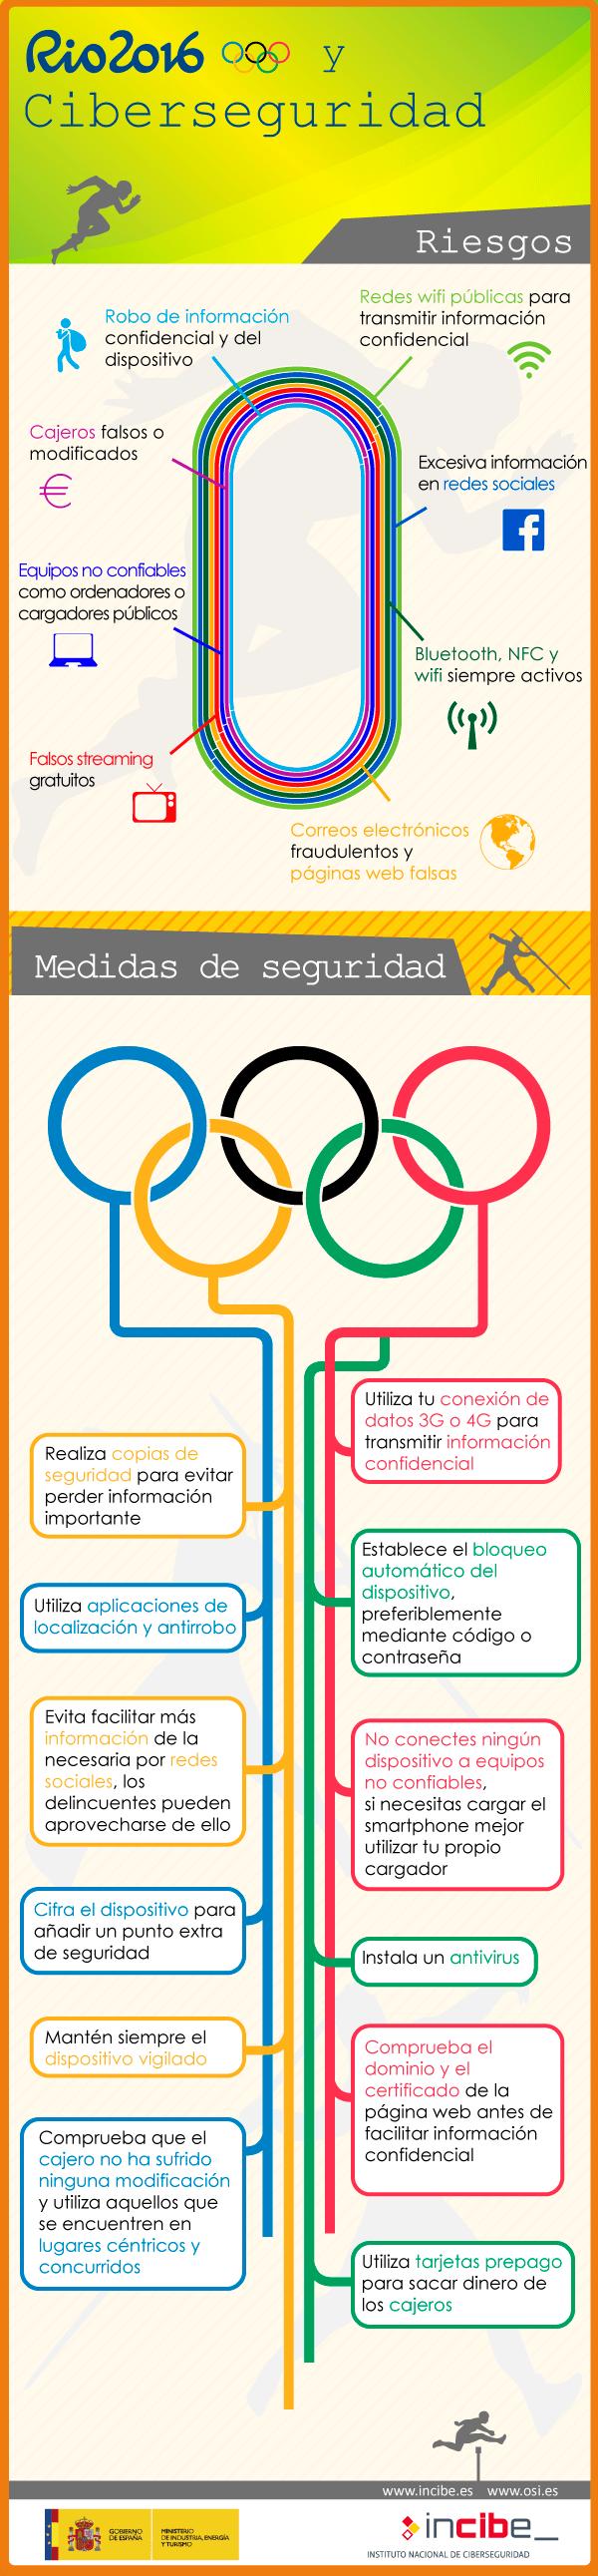 rio-2016-ciberseguridad-infografia